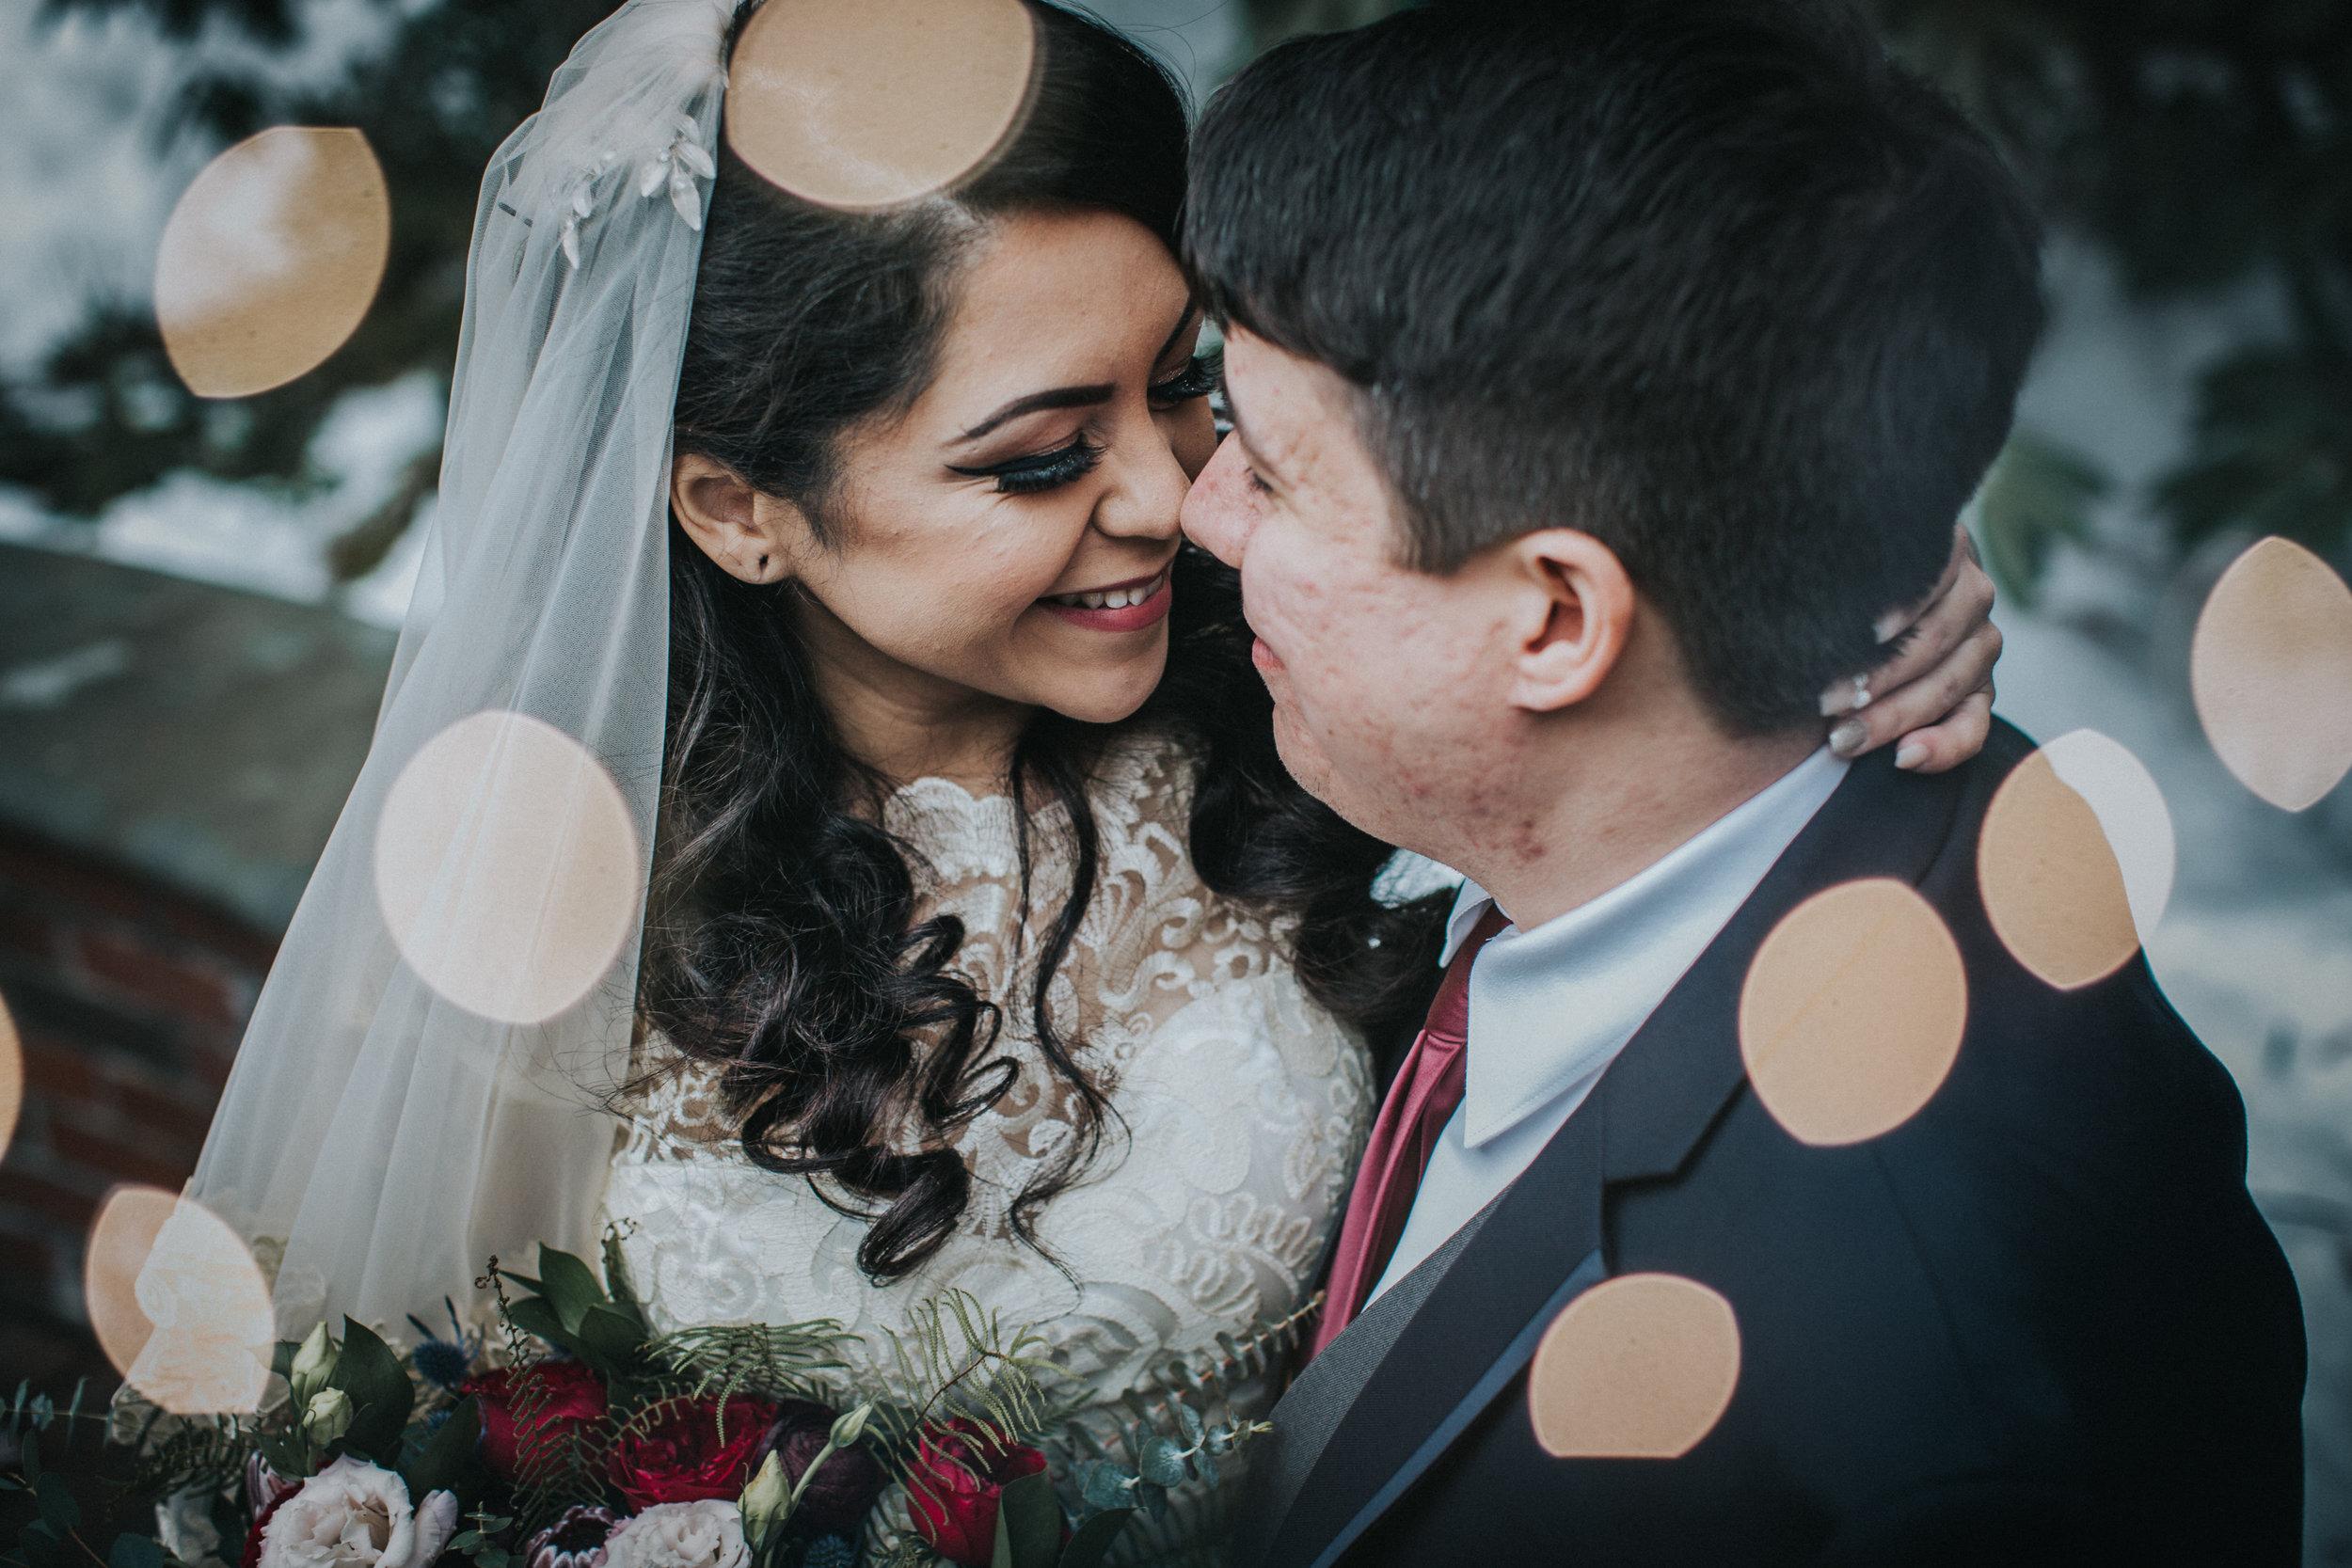 New-Jersey-Wedding-Photographer-ReceptionCenter-Valeria&Mike-First-Look-Bride&Groom (63 of 69).jpg